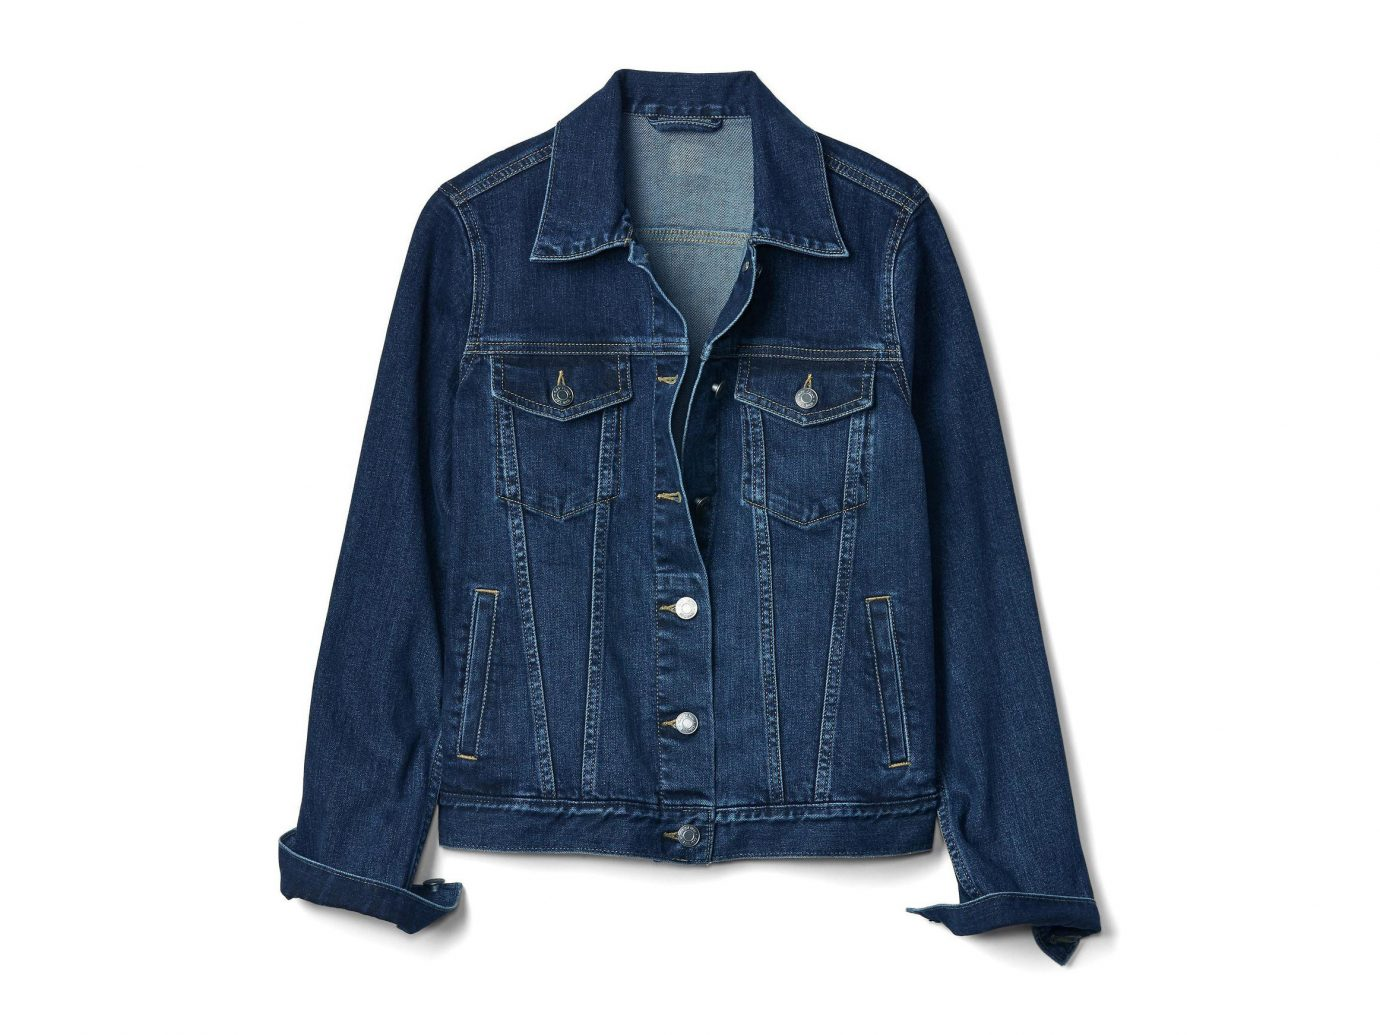 Food + Drink Romantic Getaways Weekend Getaways clothing denim person jacket wearing outerwear pocket jeans textile sleeve material product coat tan